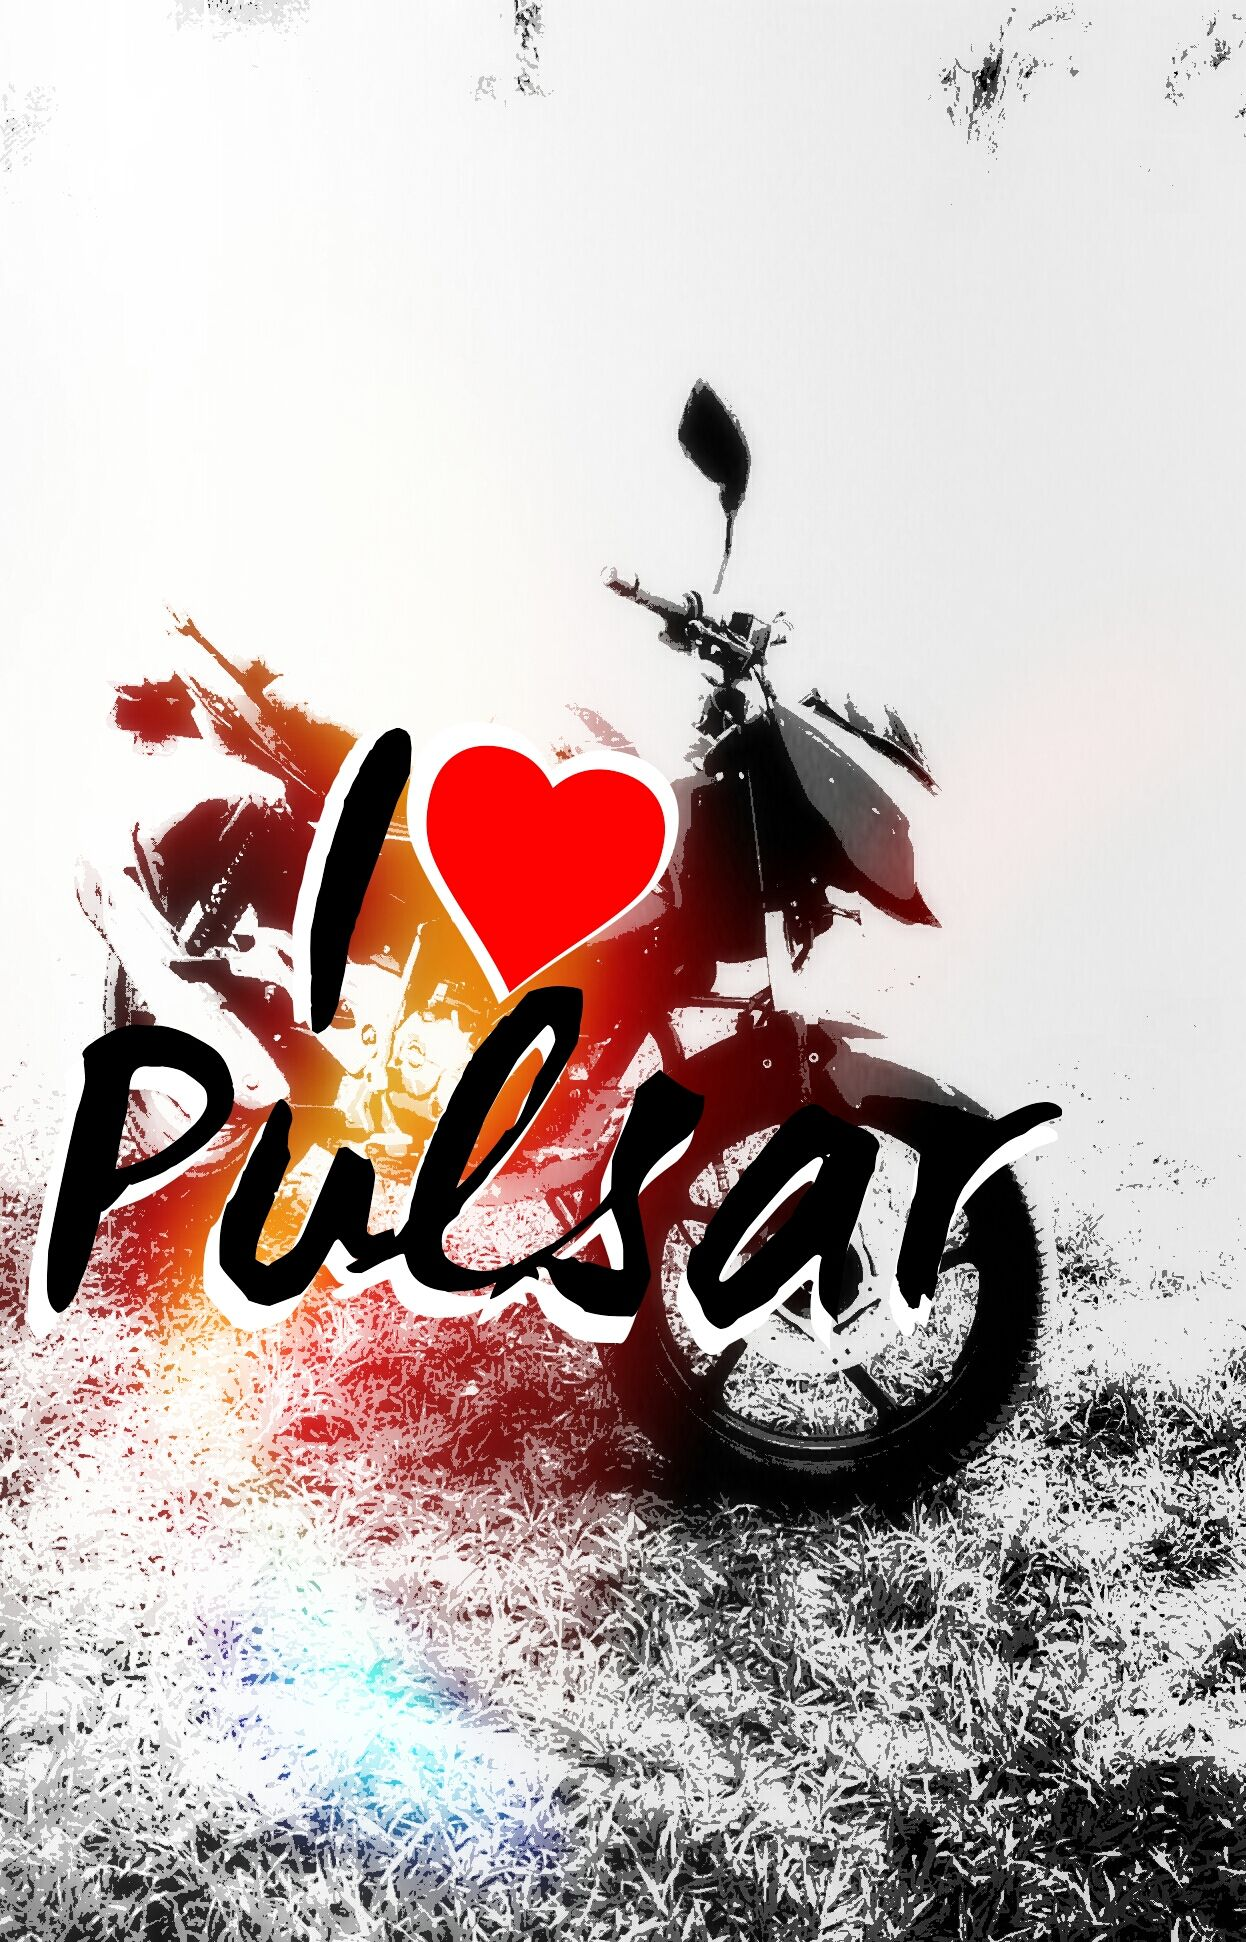 Pulsar 135